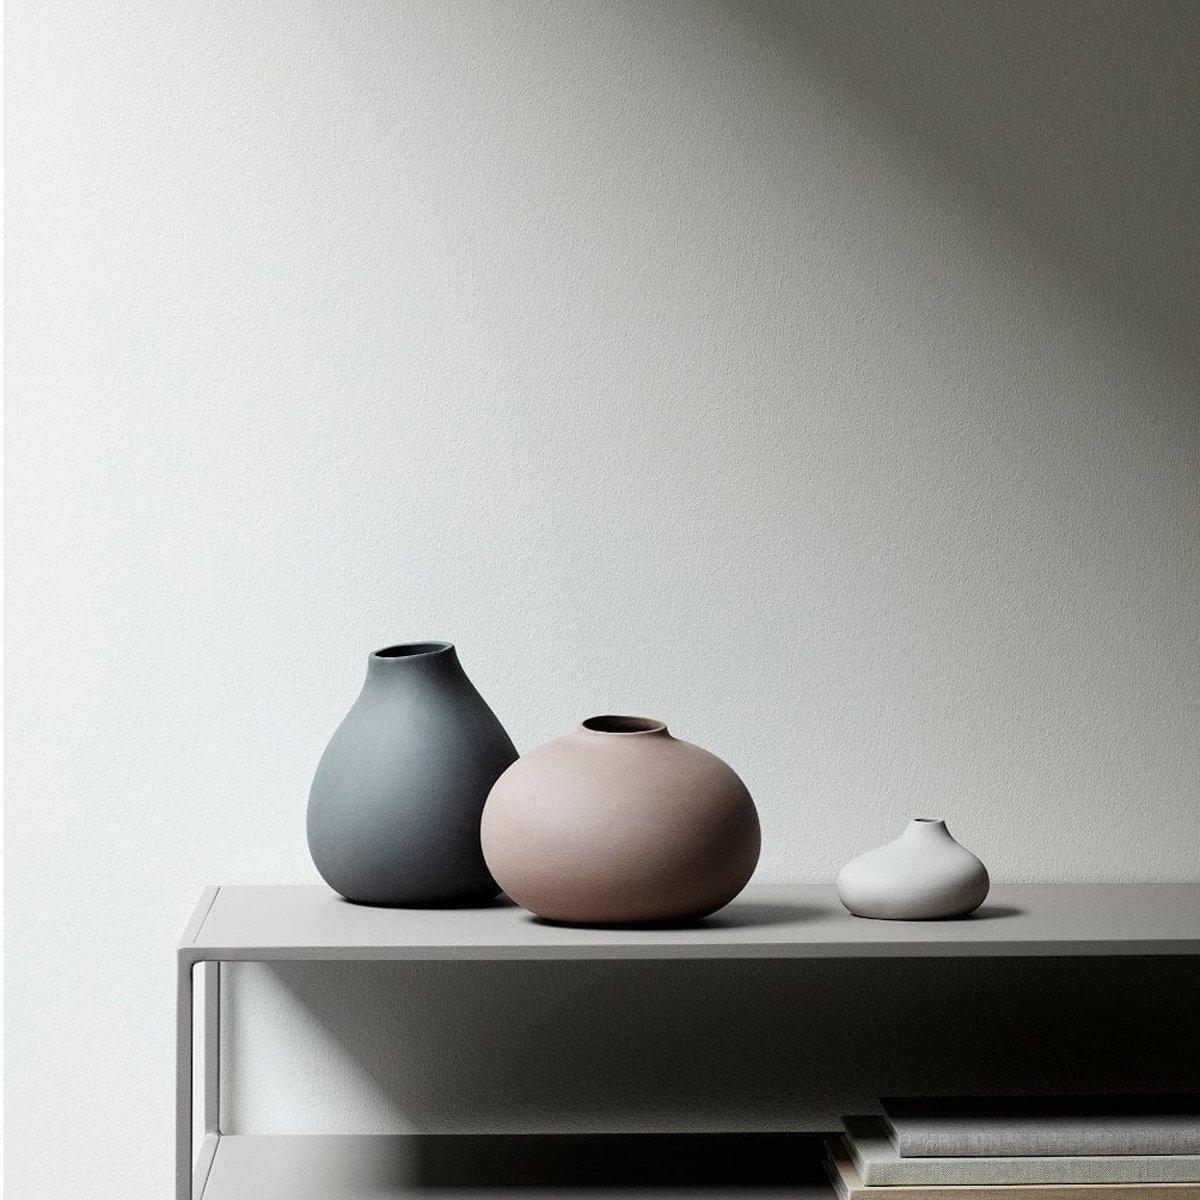 Set of 3 Vases 2